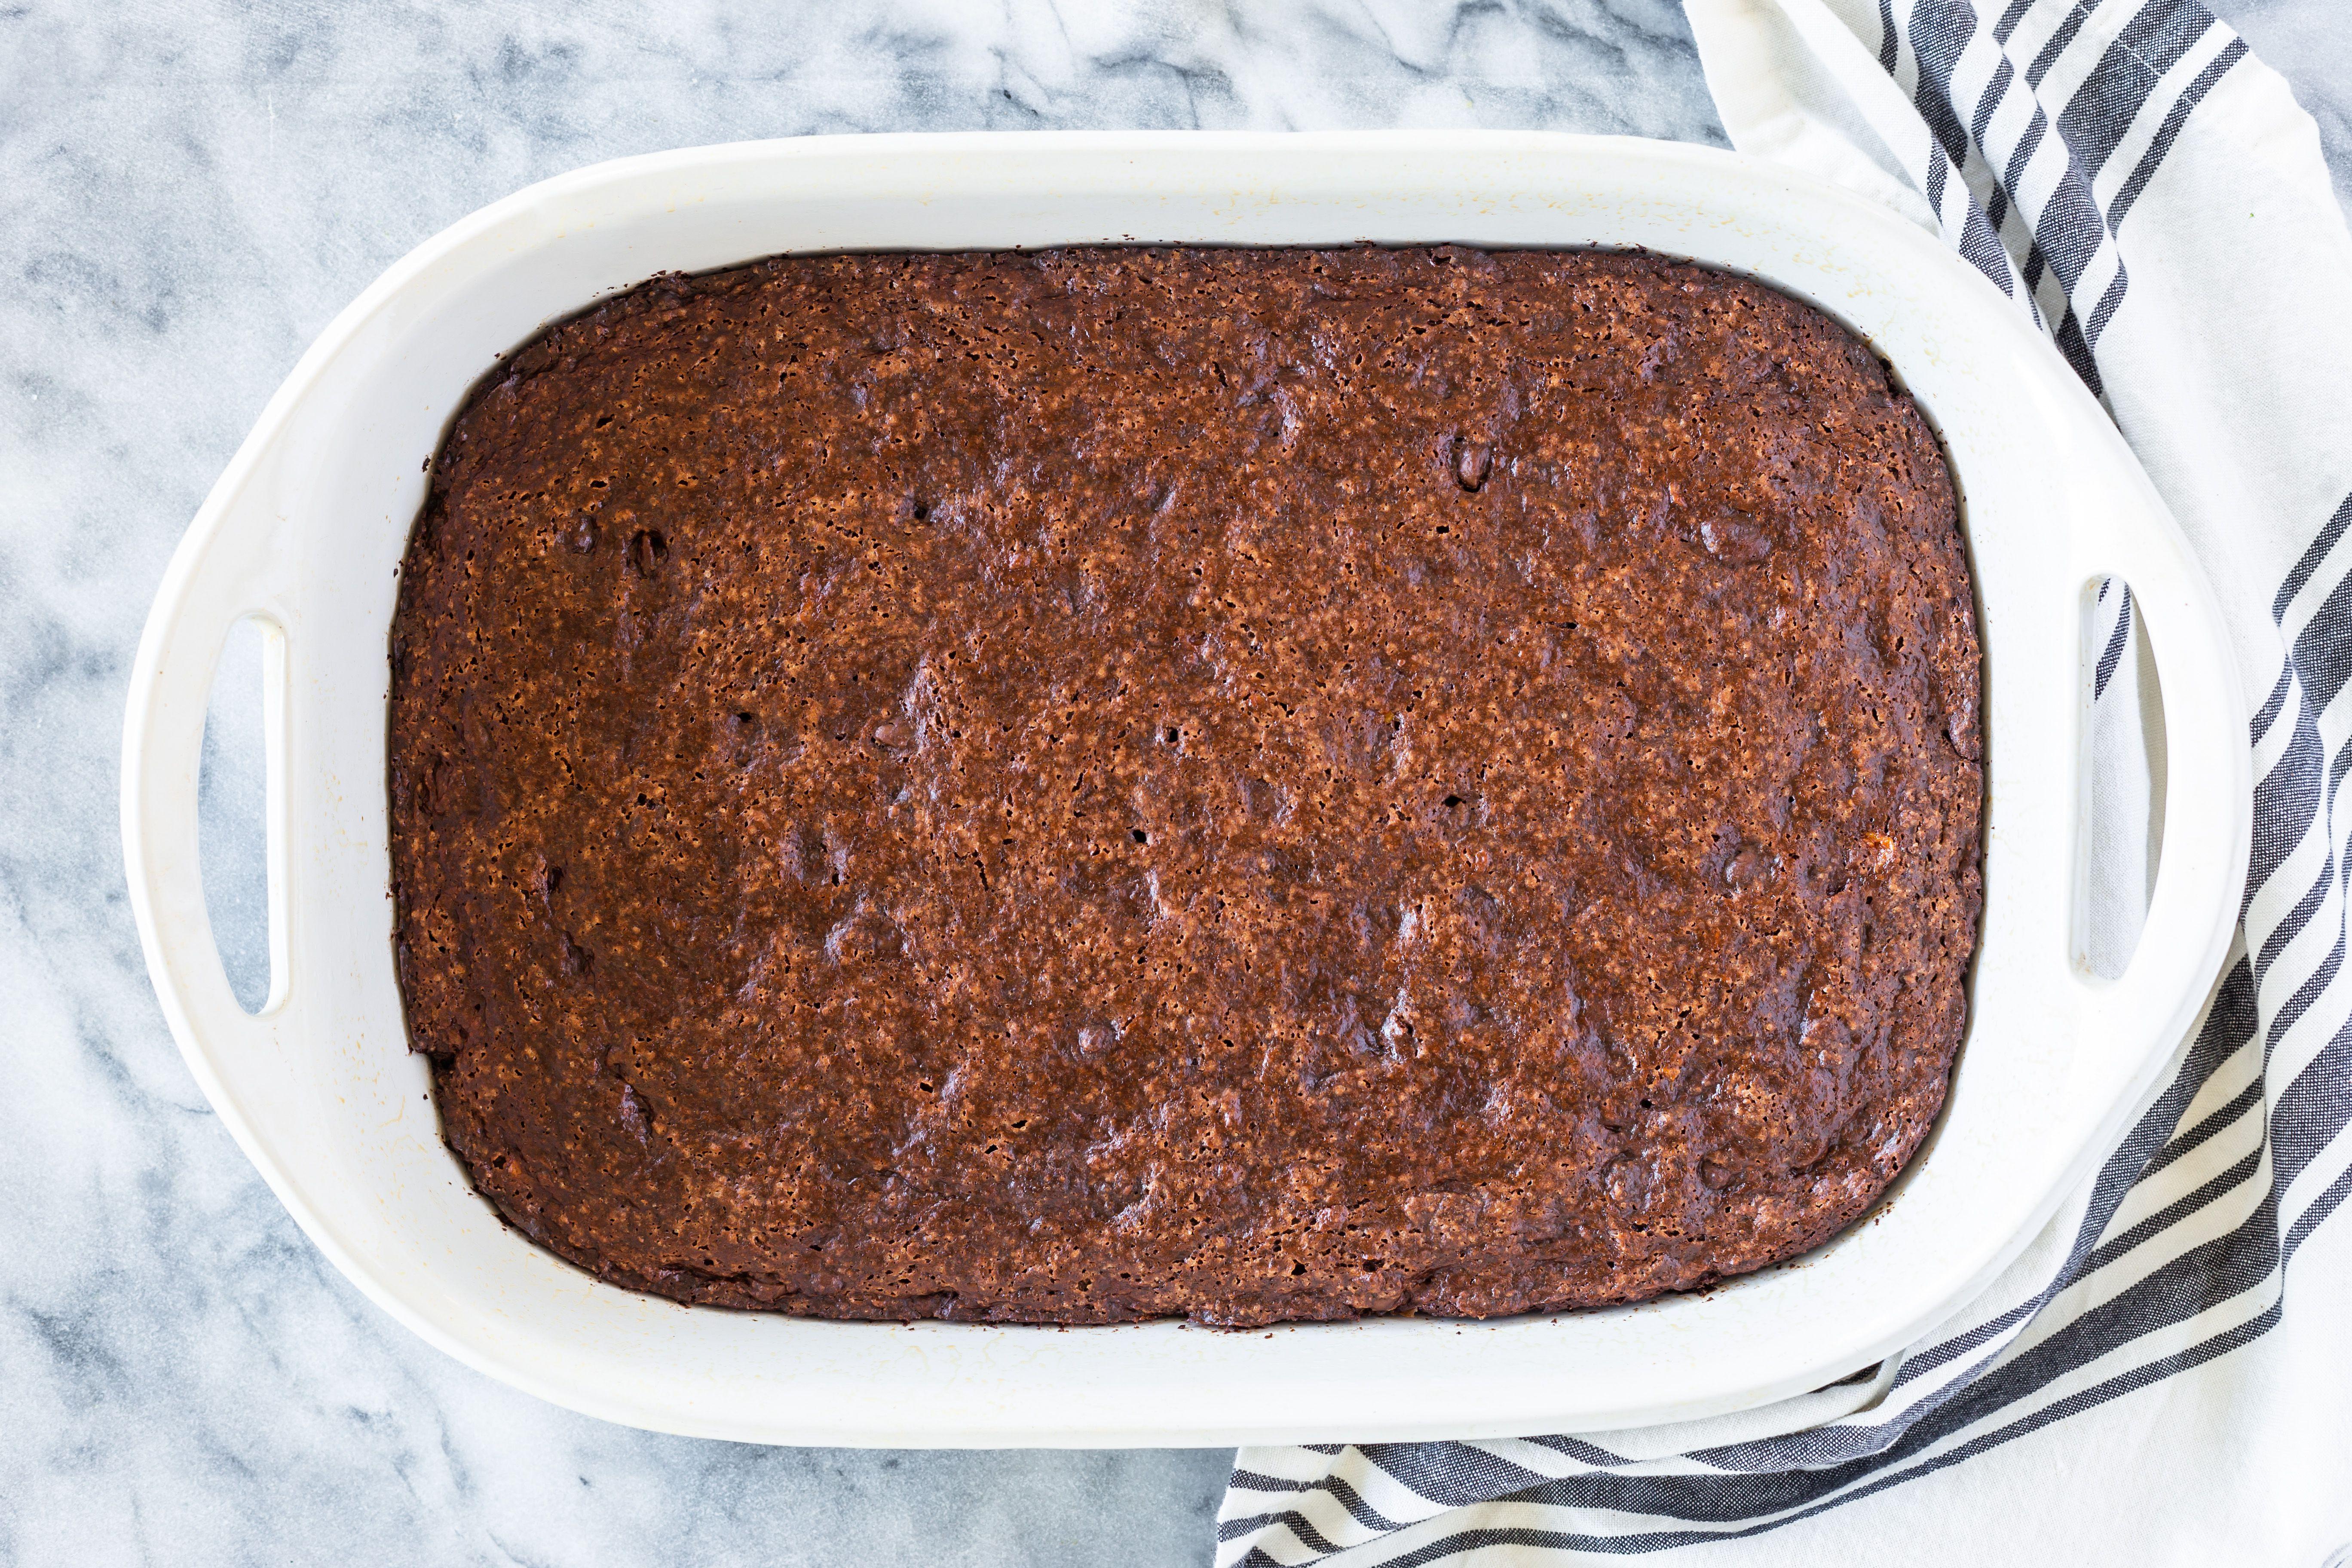 Bake brownies in oven